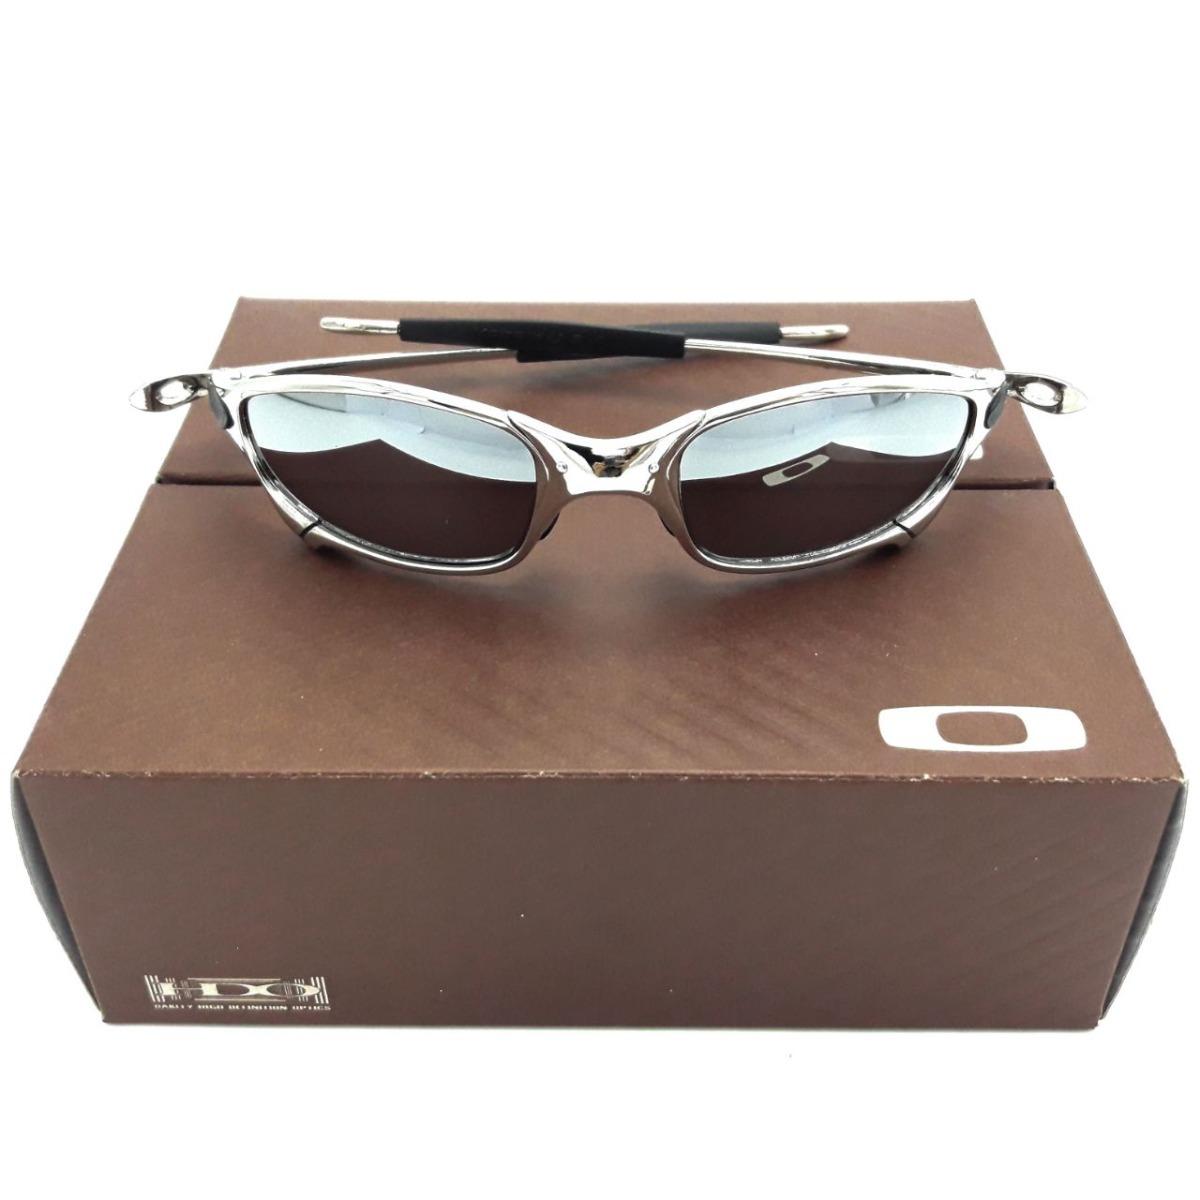 fce8e099b2ecb óculos oakley juliet 24k penny double x romeo squared!!! Carregando zoom.